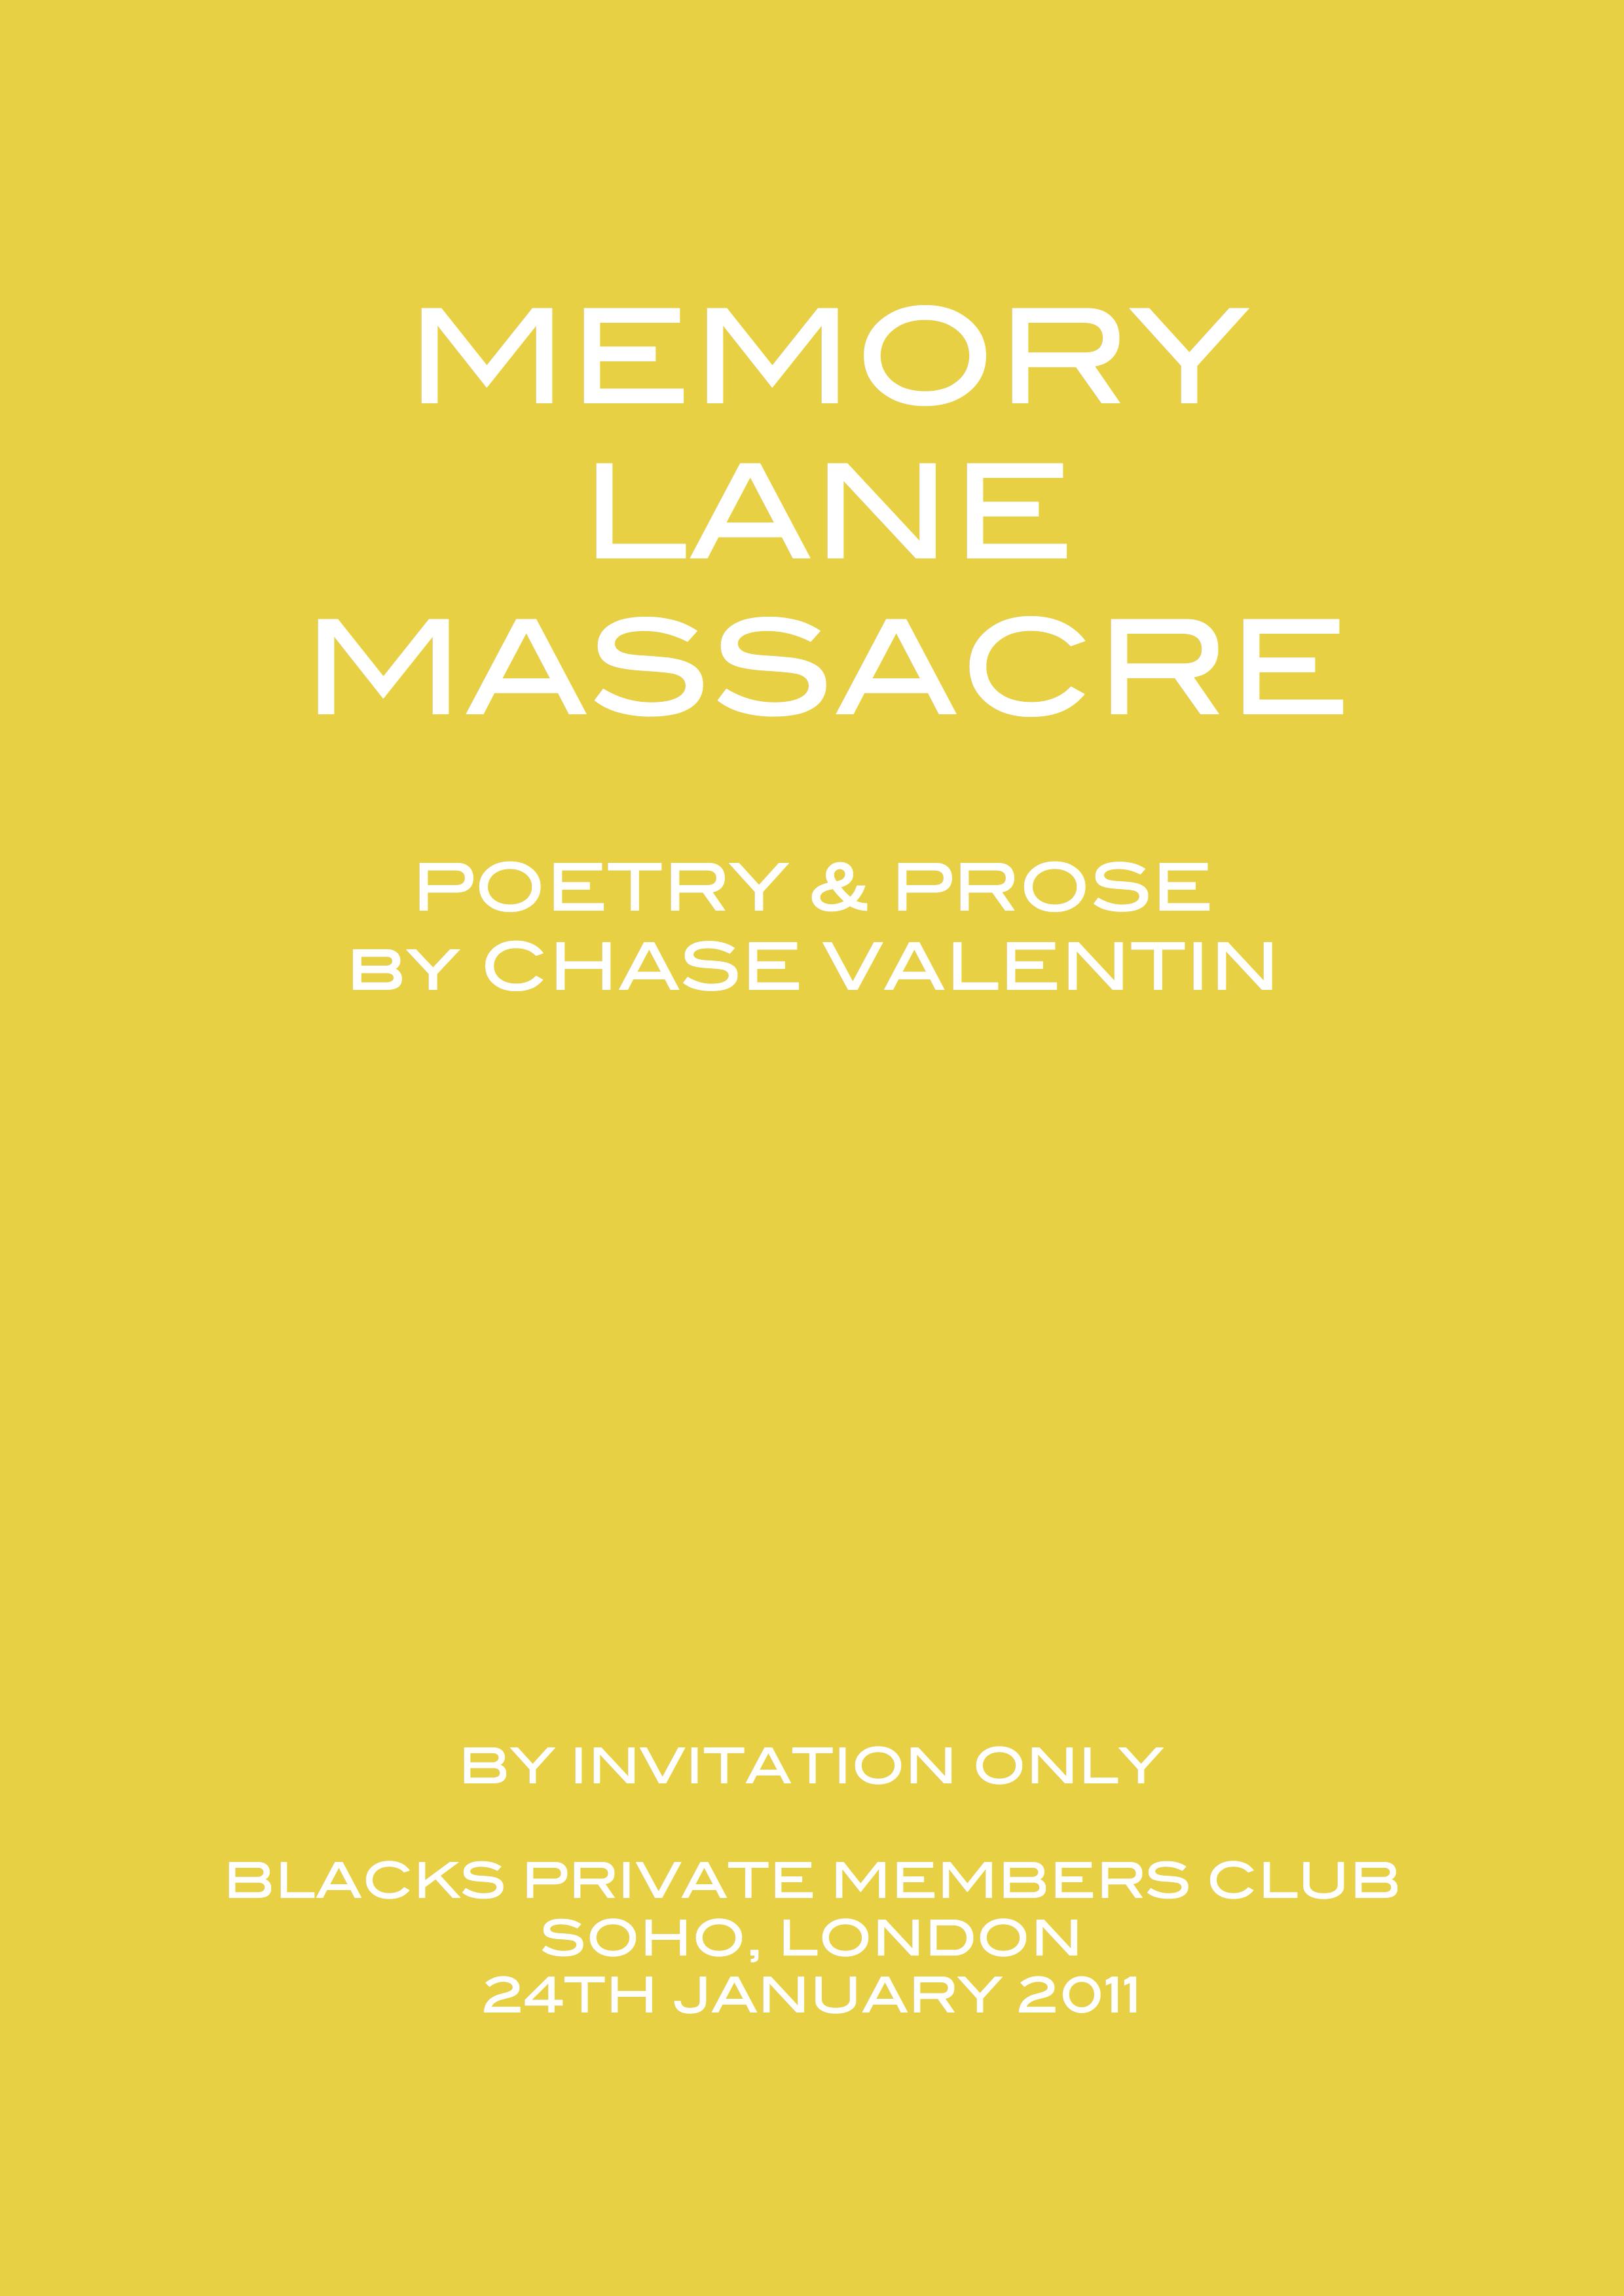 Memory Lane Massacre 2011